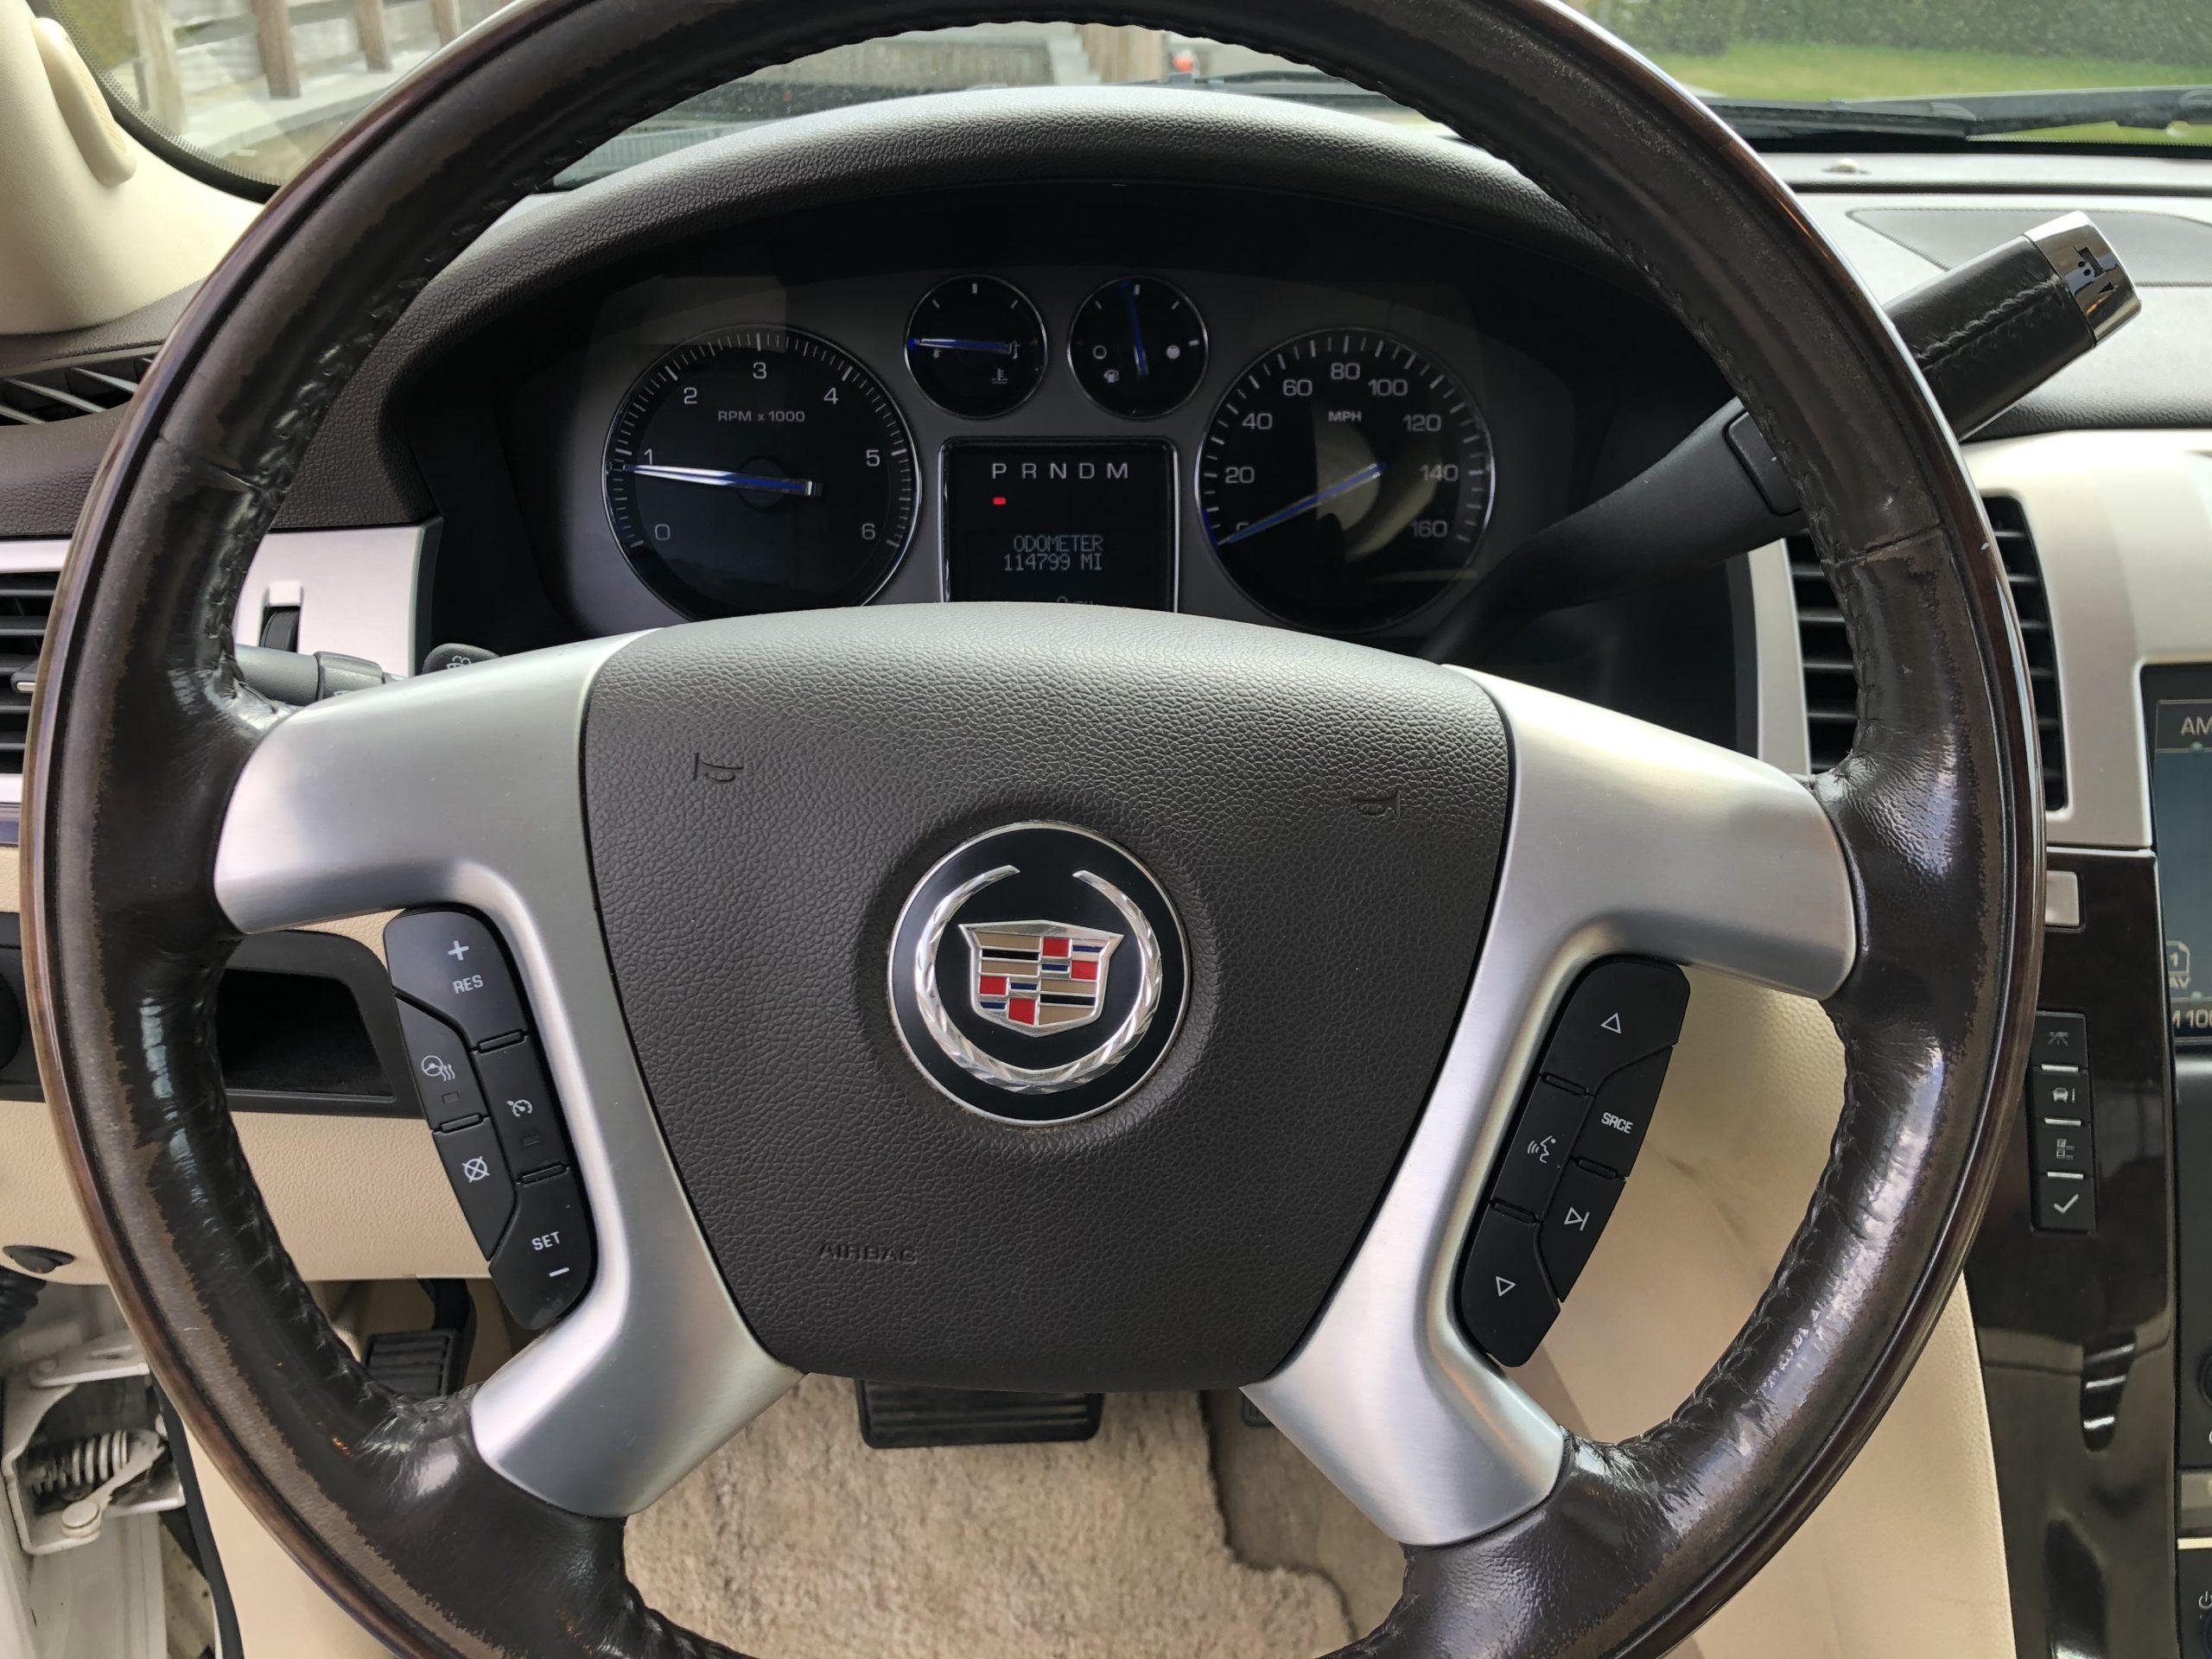 Cadillac Escalade EXT 6.2i - 2007 - LPG - LICHTE VRACHT ...